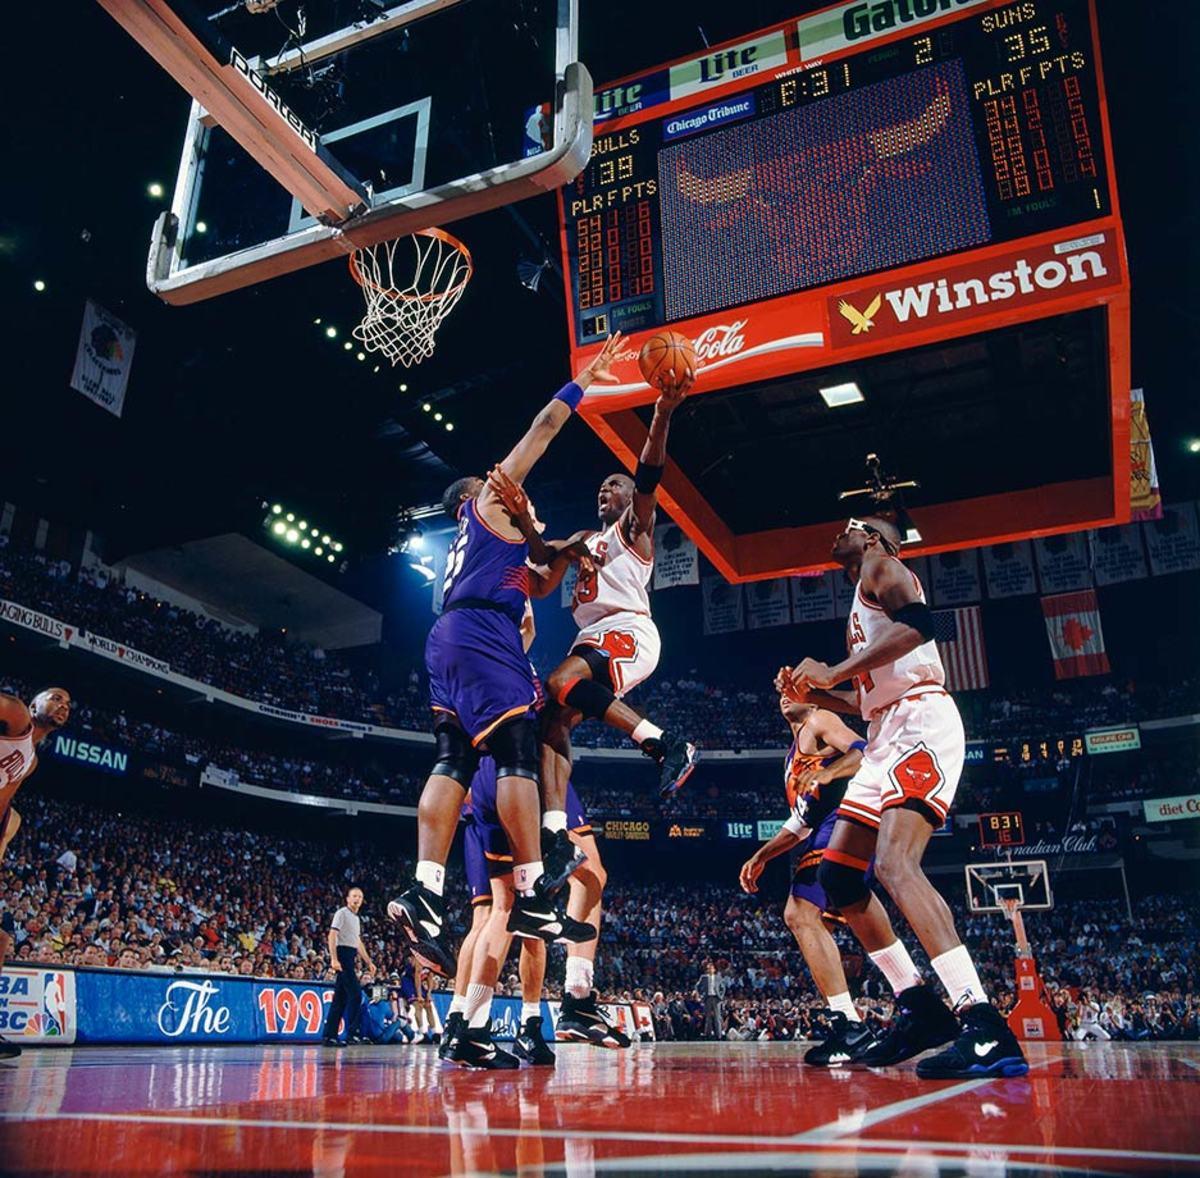 1993-0616-Michael-Jordan-080066196.jpg